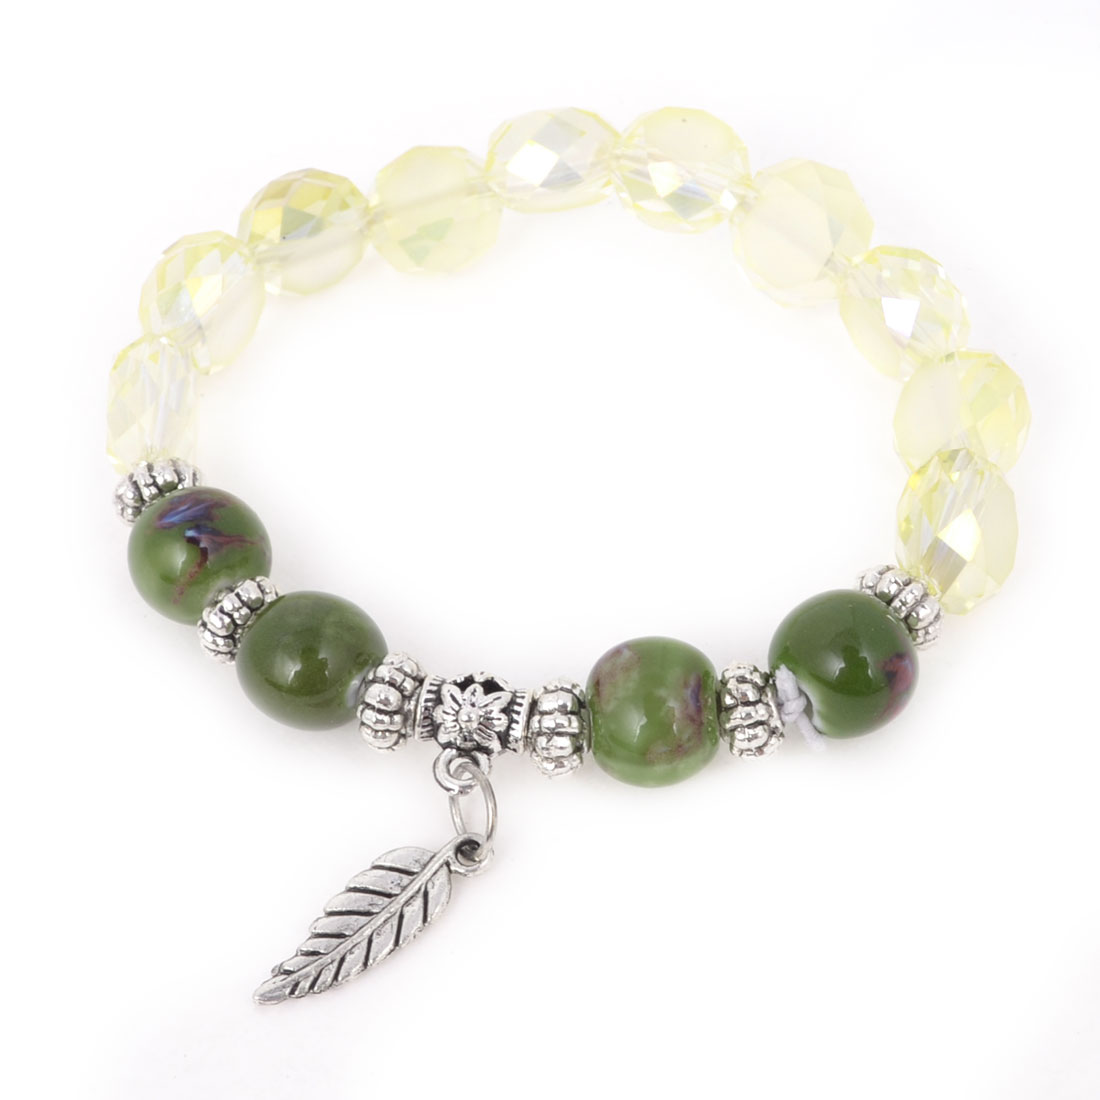 Ladies Wrist Decor Silver Tone Leaf Accent Elastic Faux Crystal Bangle Bracelet